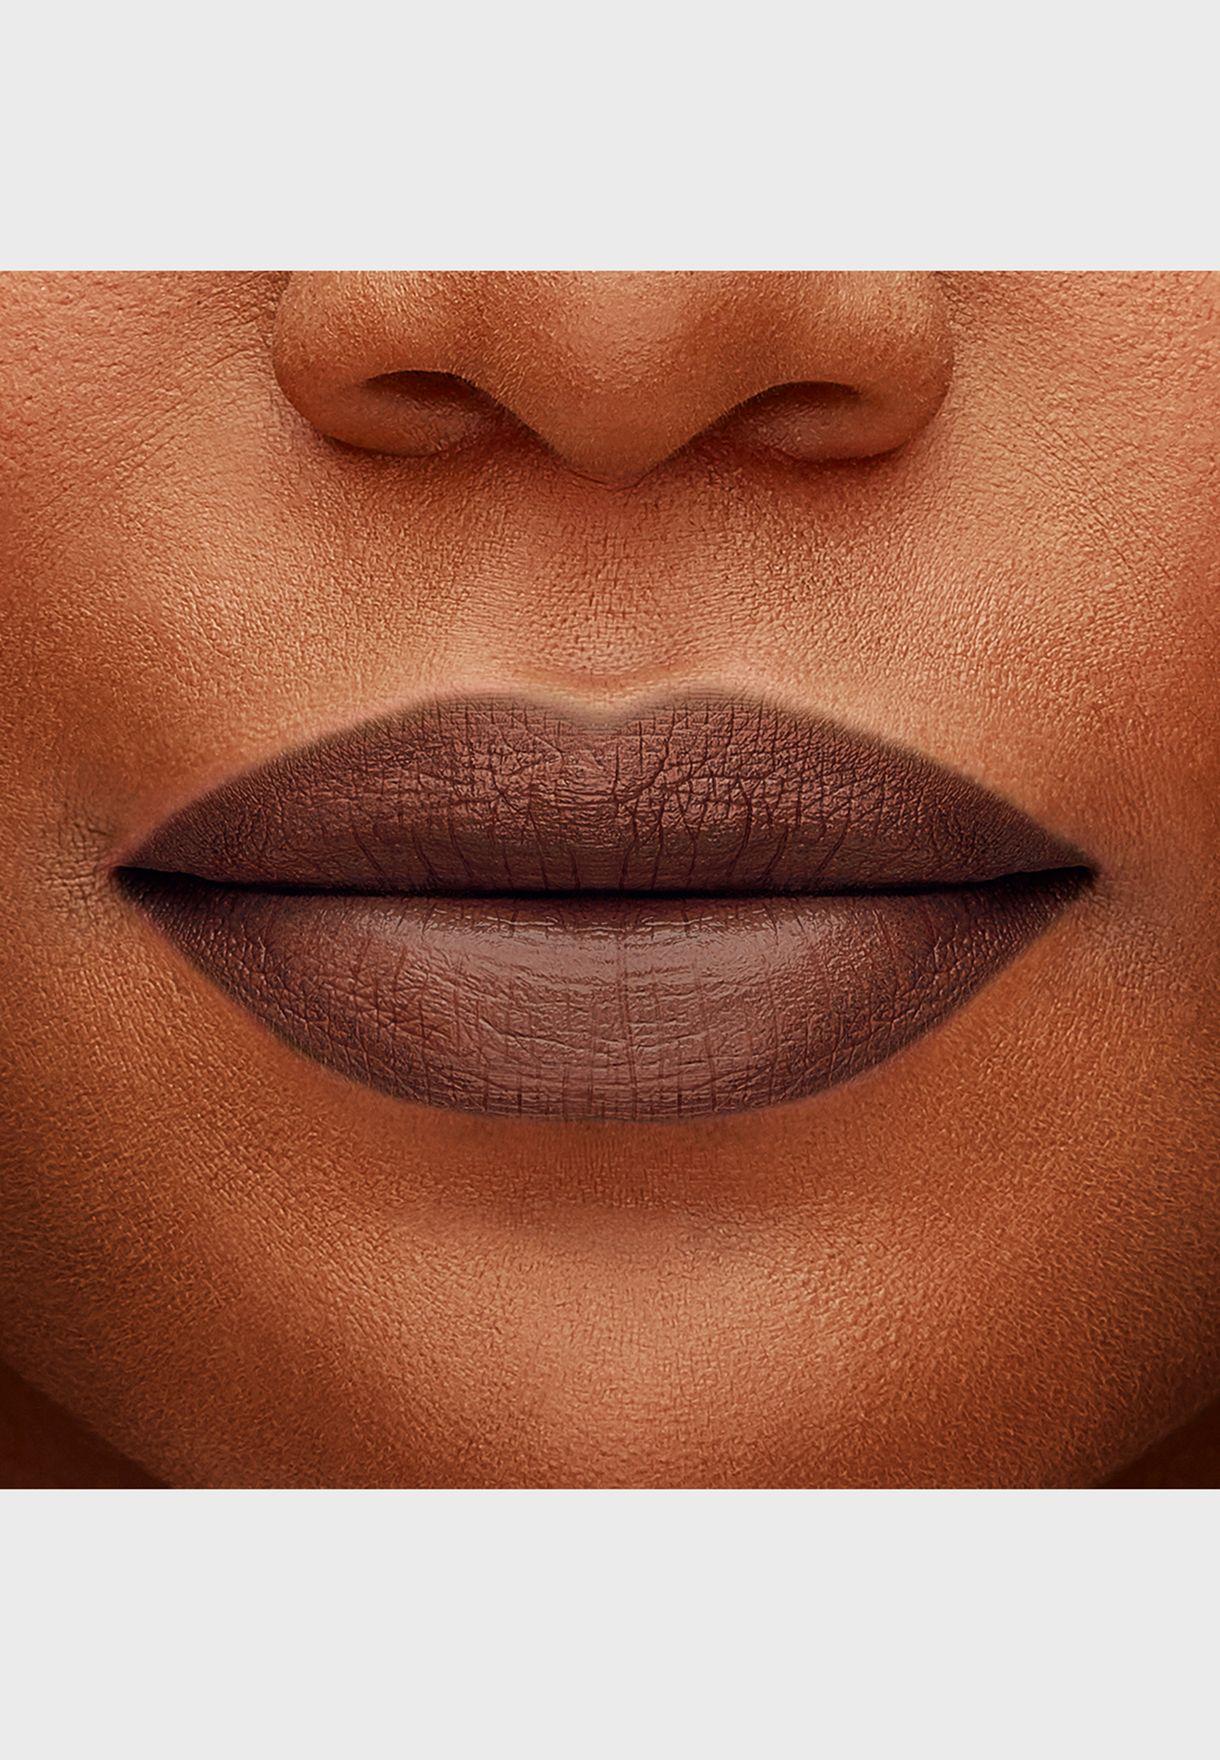 Rouge Fabuleux Lipstick- Reve Tonka 16